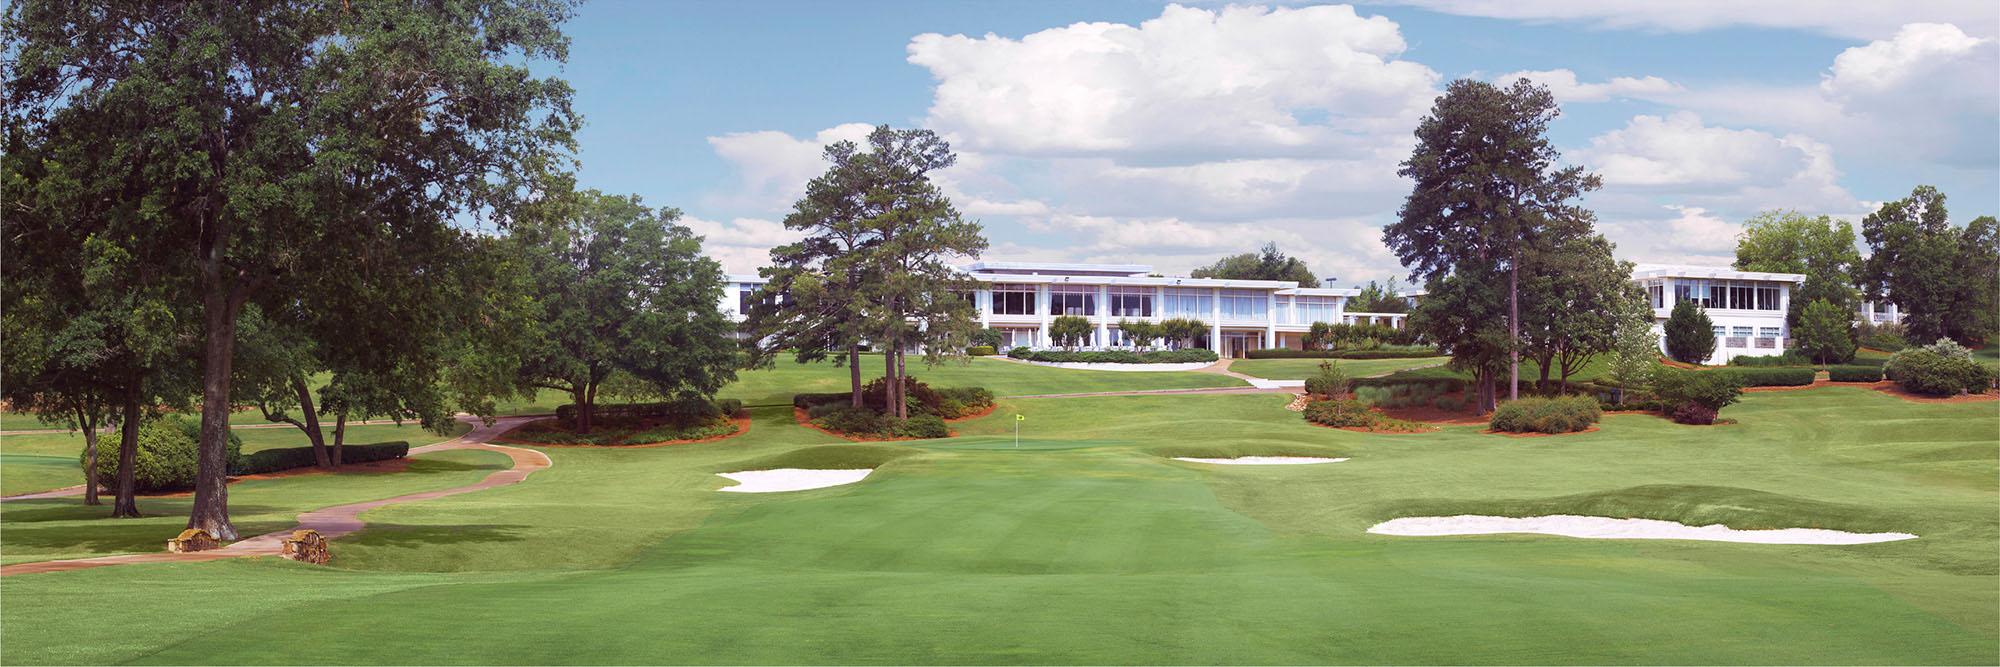 Golf Course Image - Country Club of Jackson No. 18